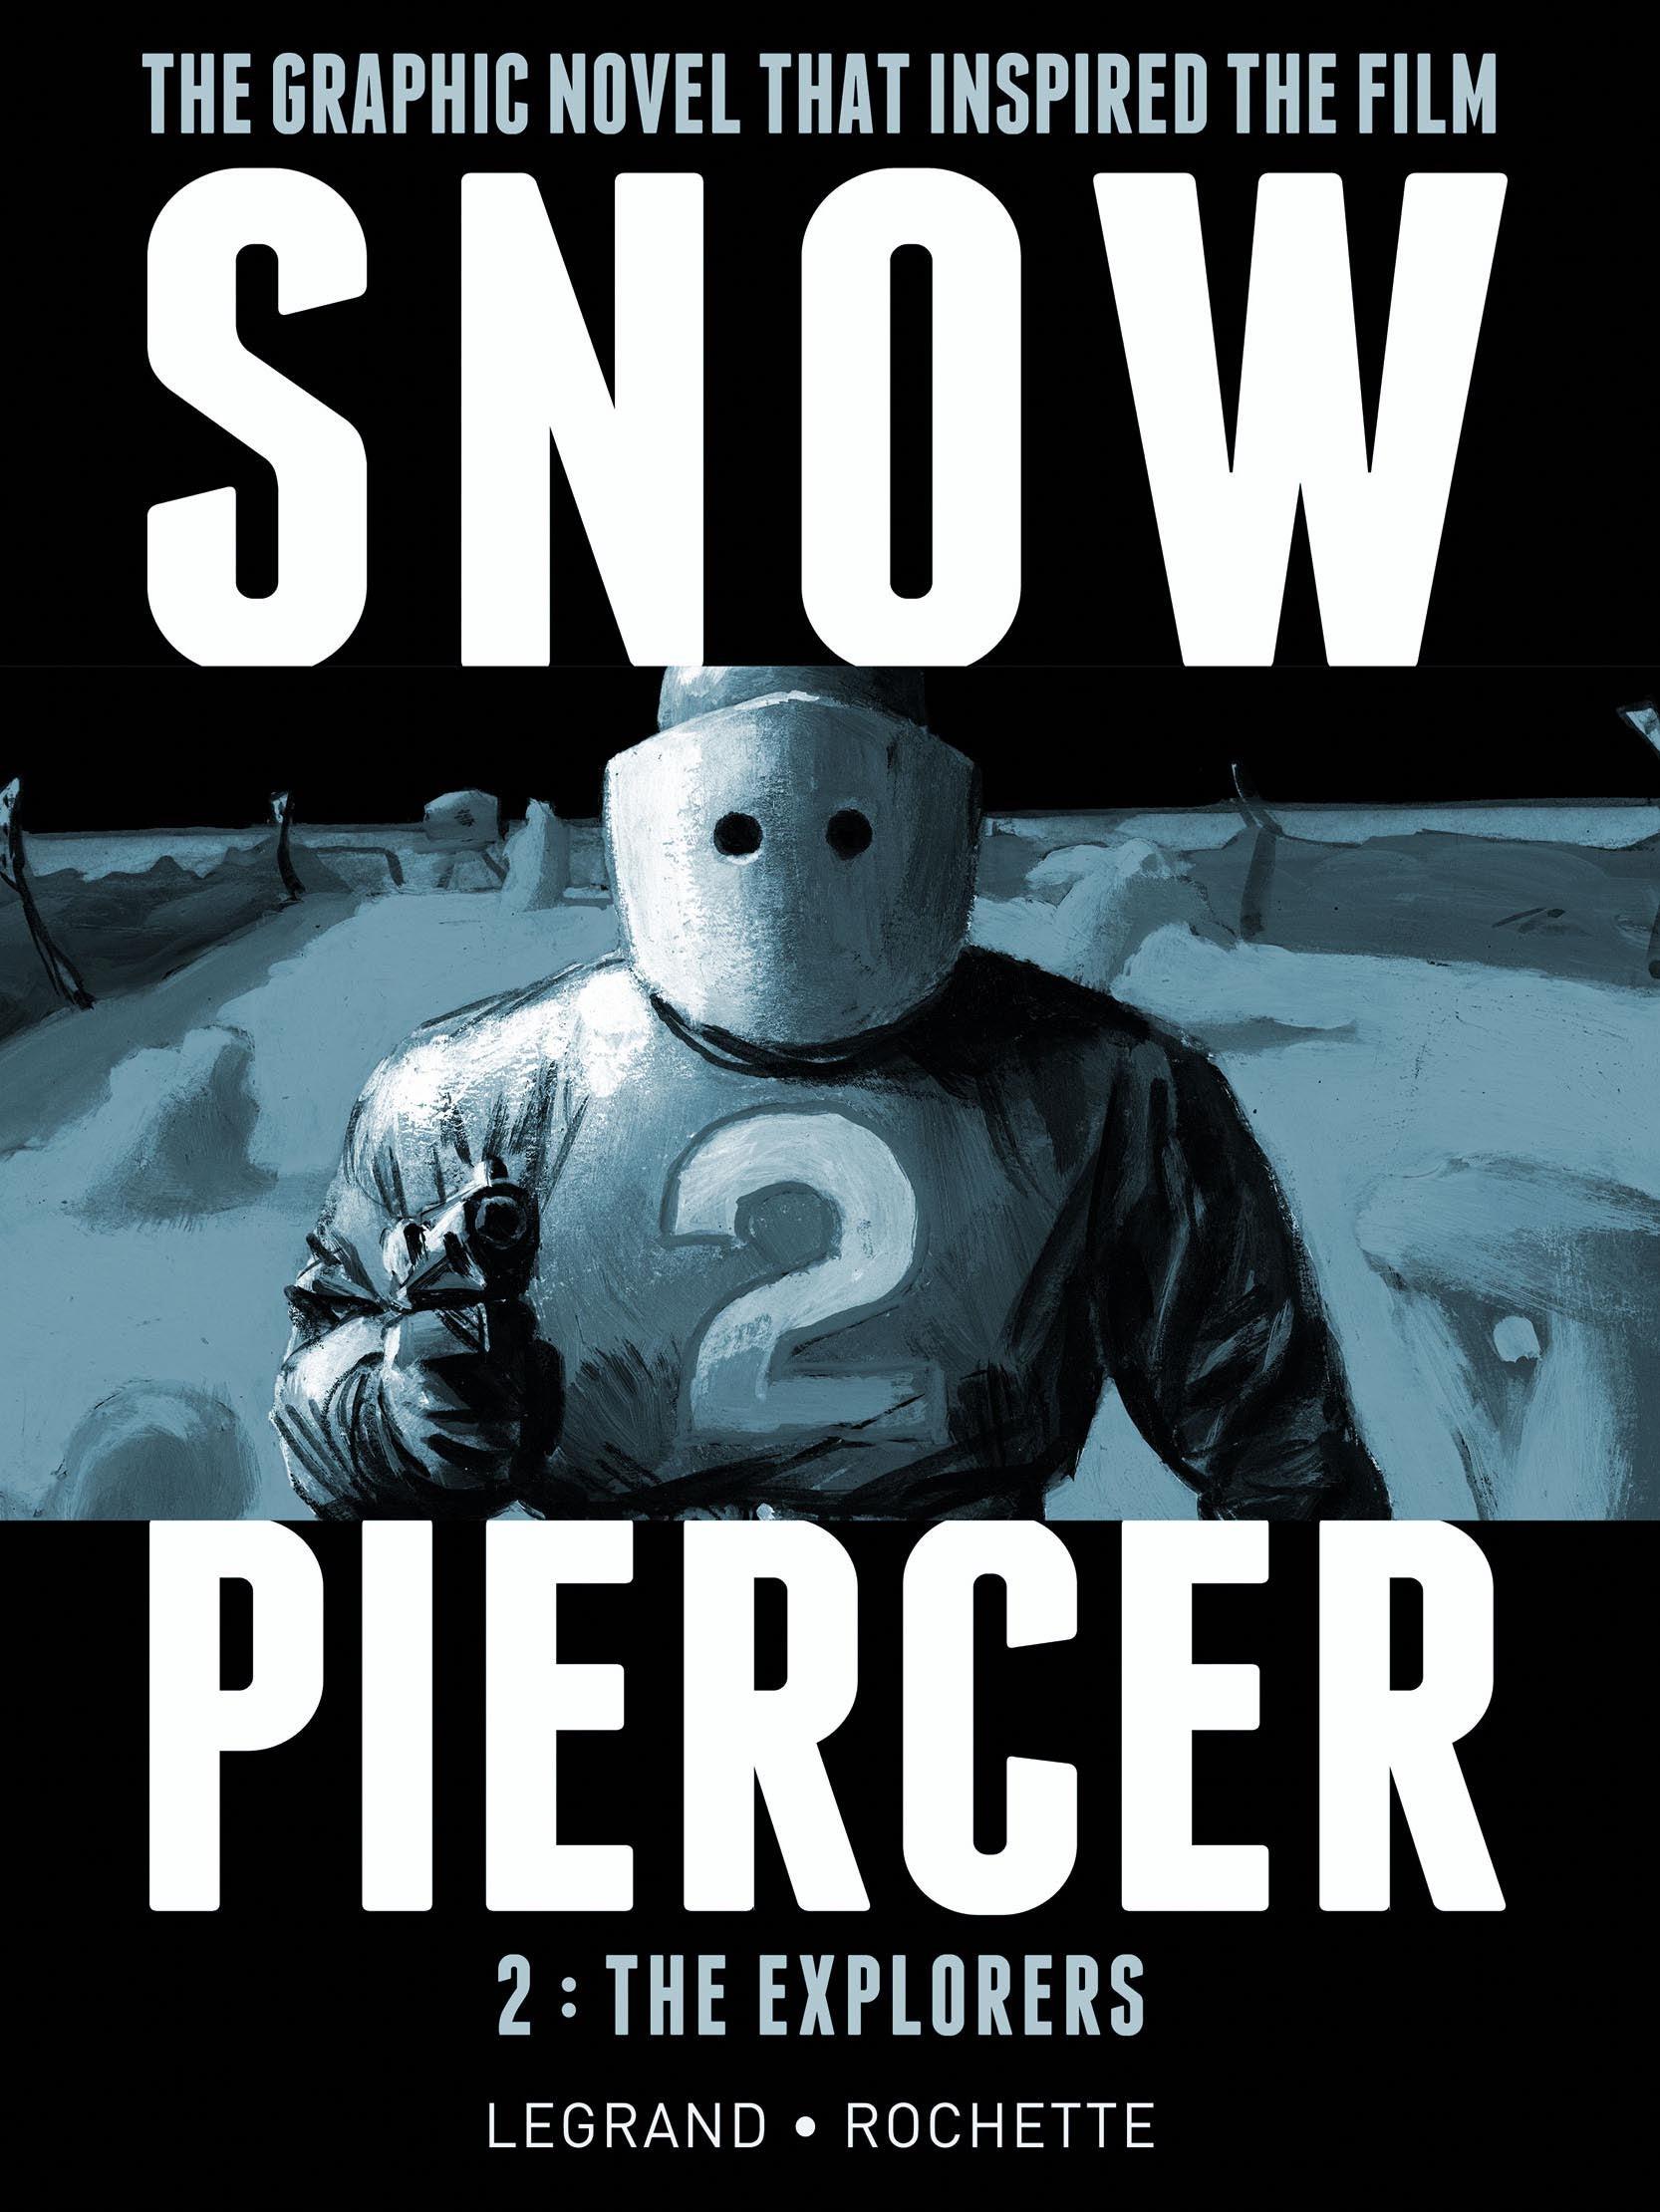 SNOWPIERCER VOL.2 THE EXPLORERS